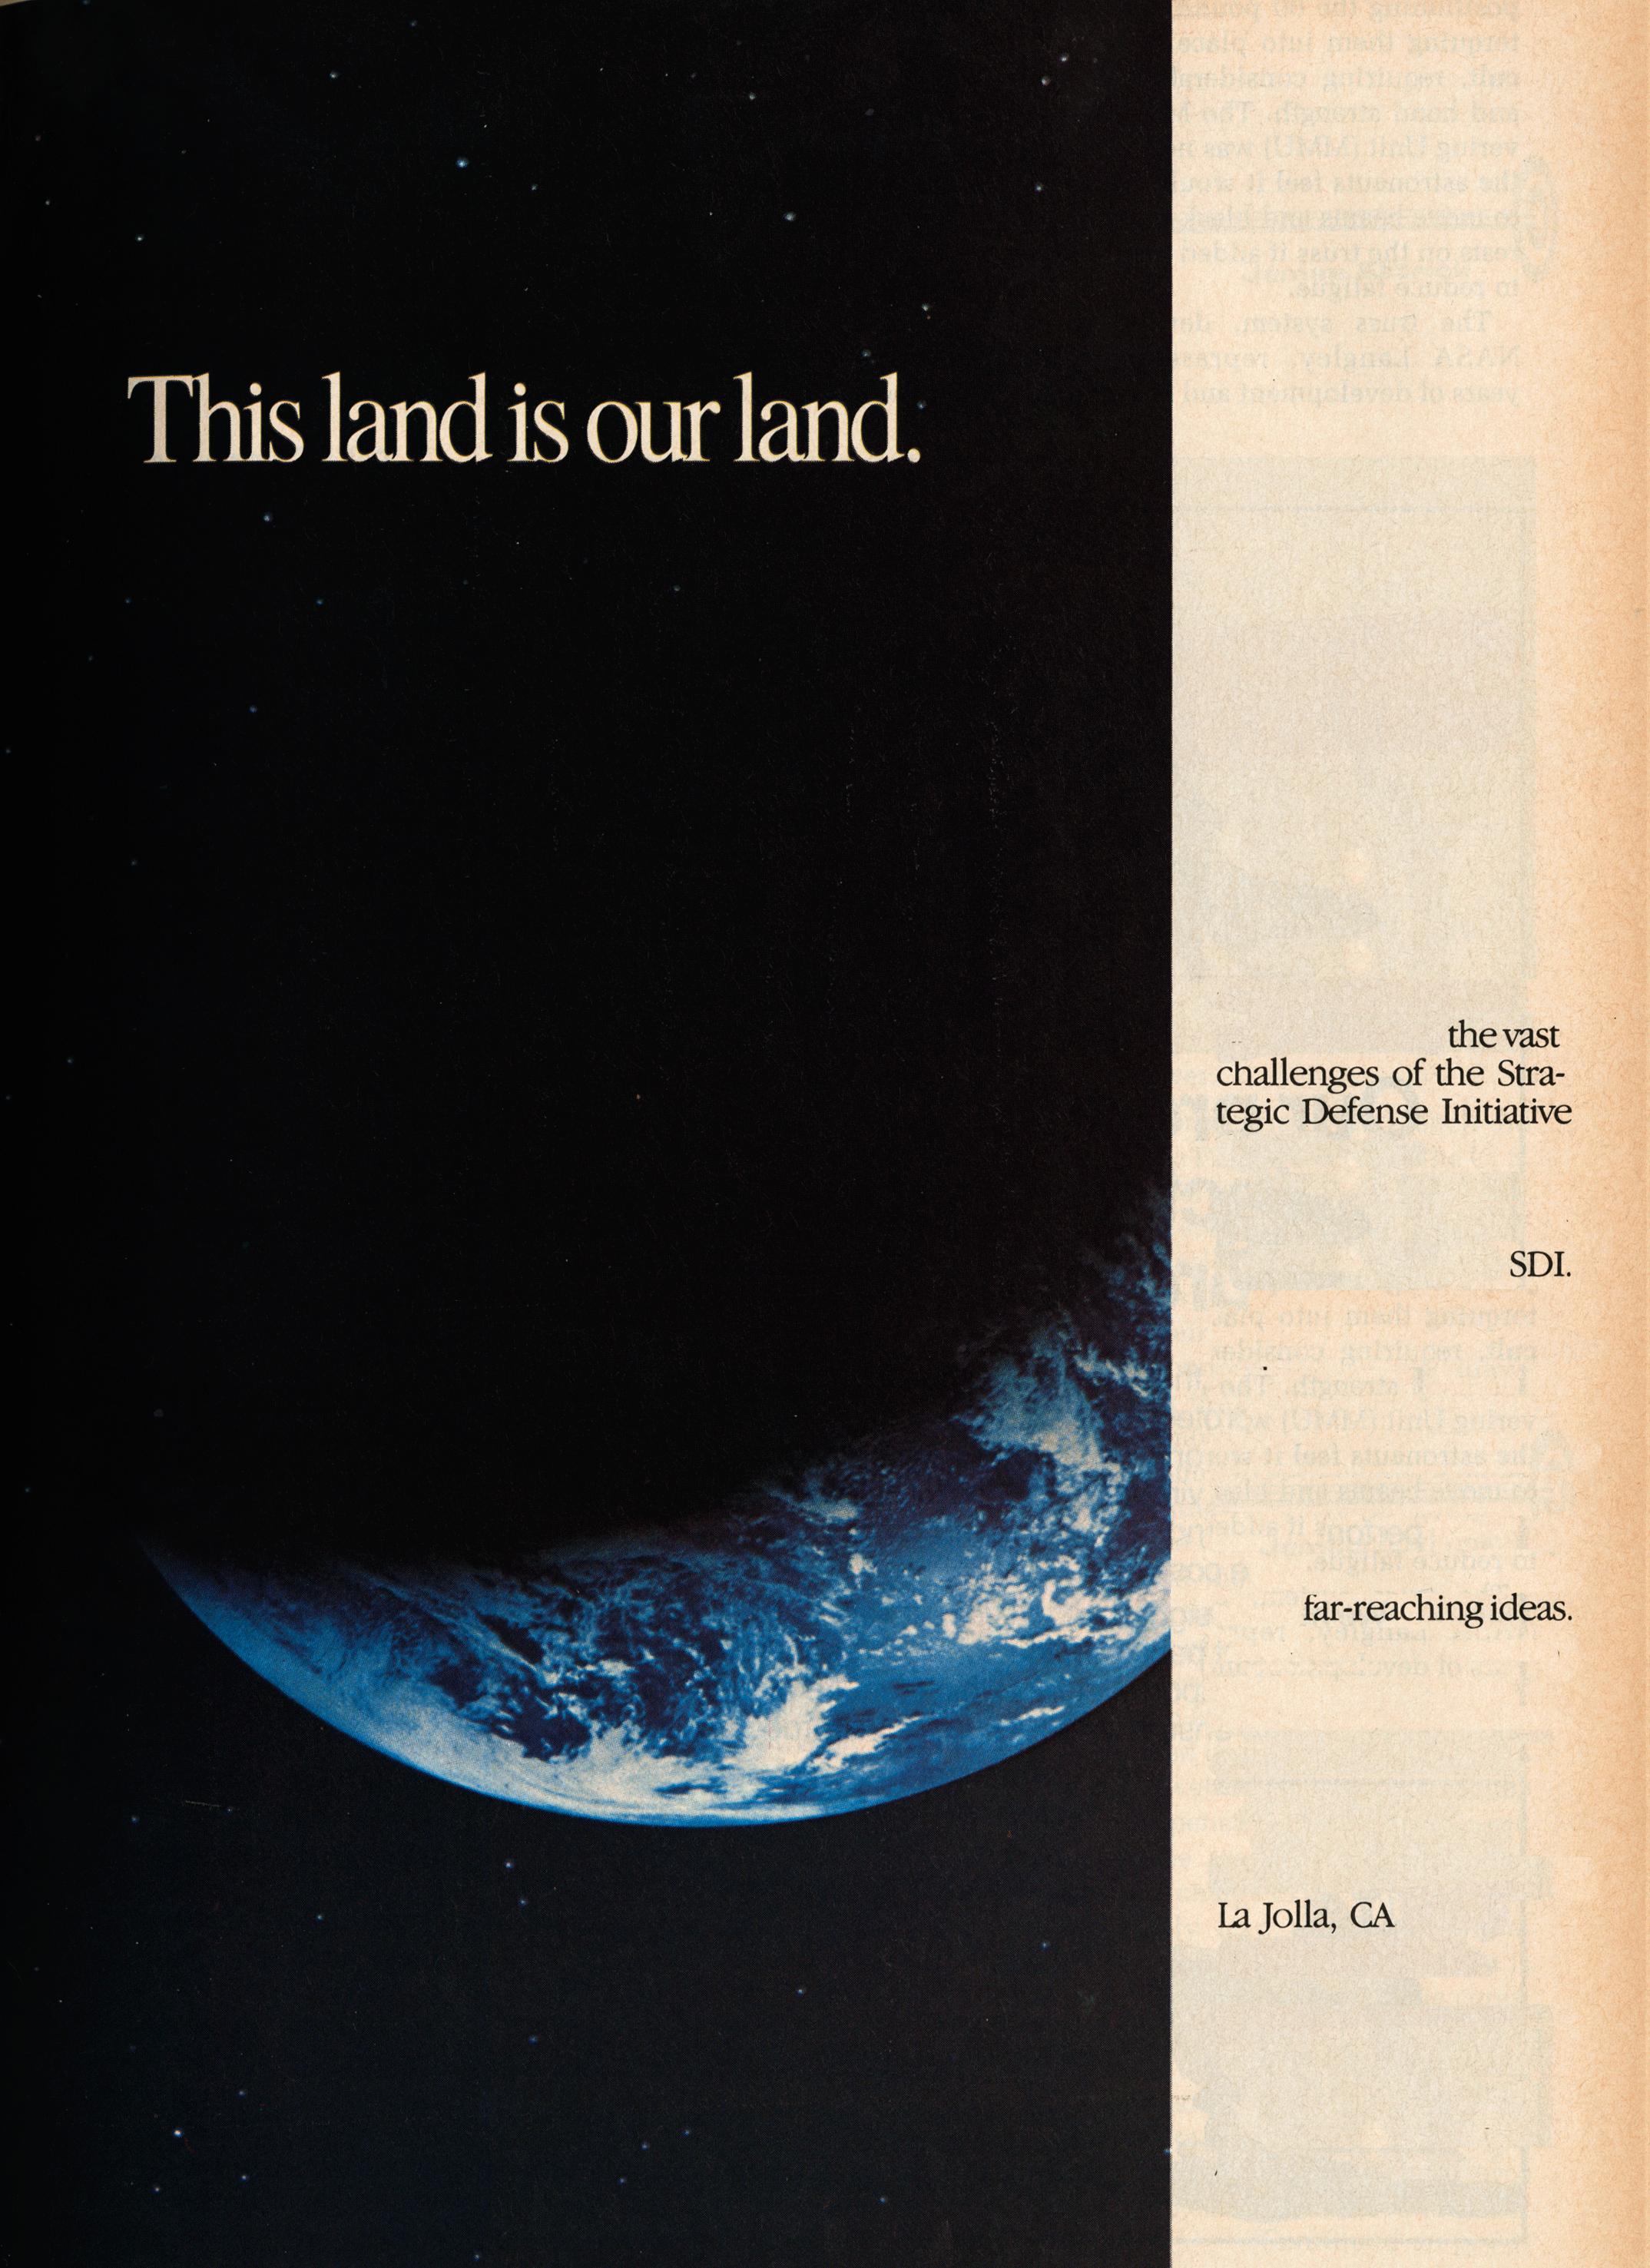 La Jolla, 1985